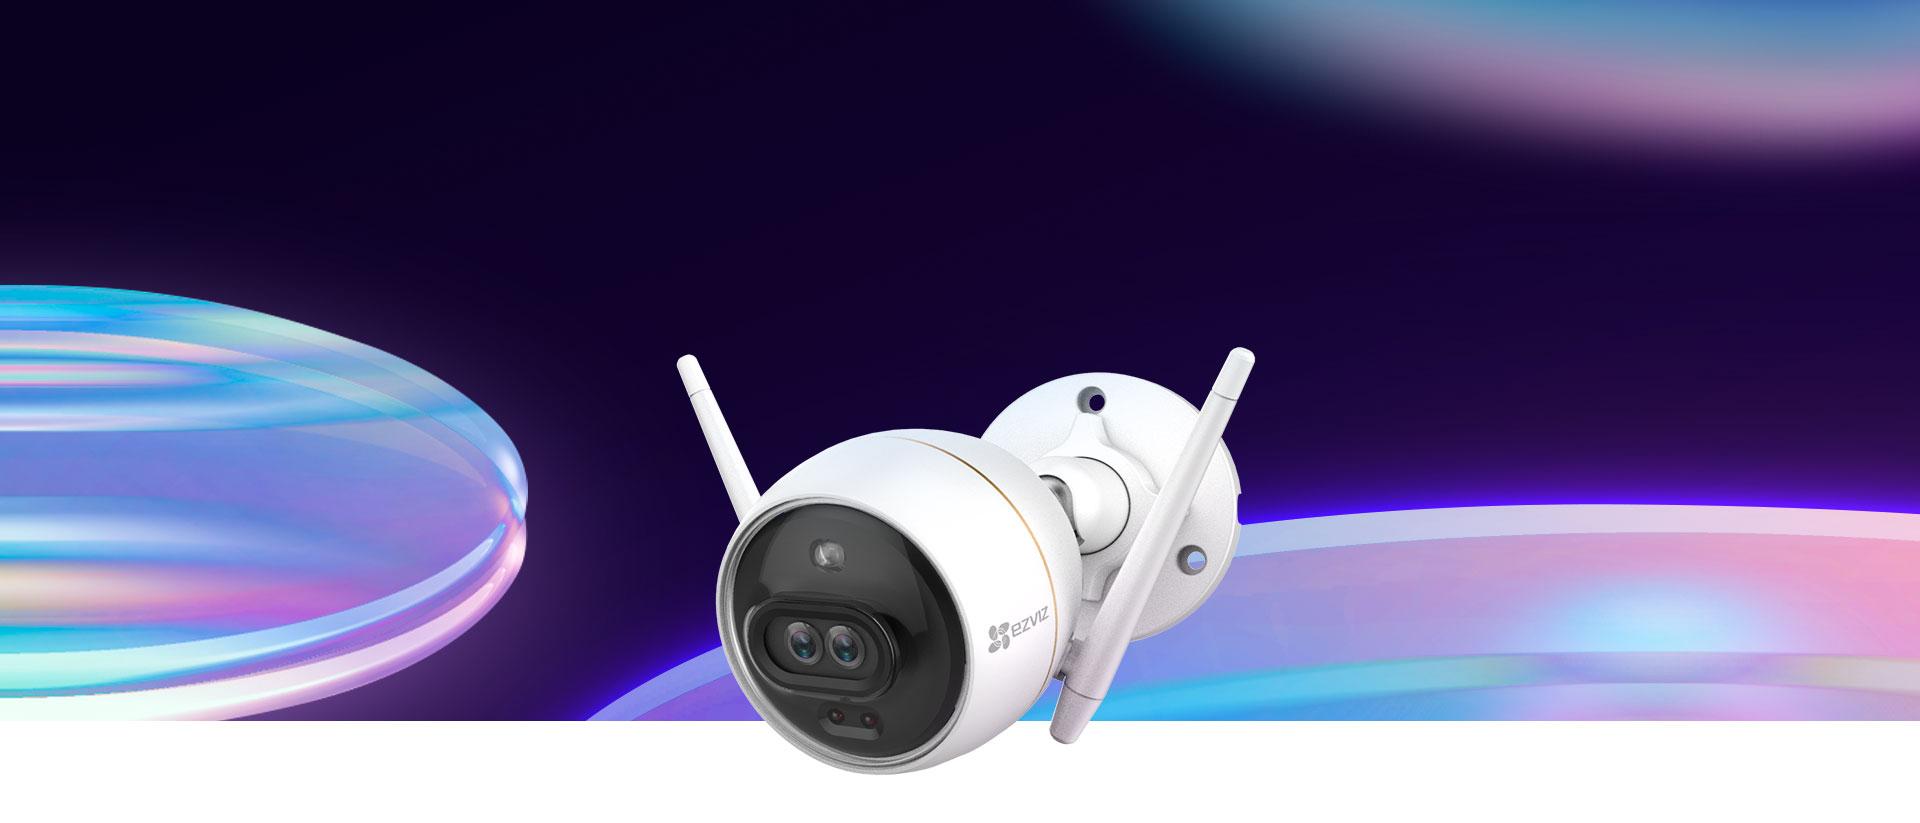 1-EZVIZ C3X Smart Outdoor Wi-Fi Dual-Lens Security Camera with Color Night Vision CS-CV310.jpg